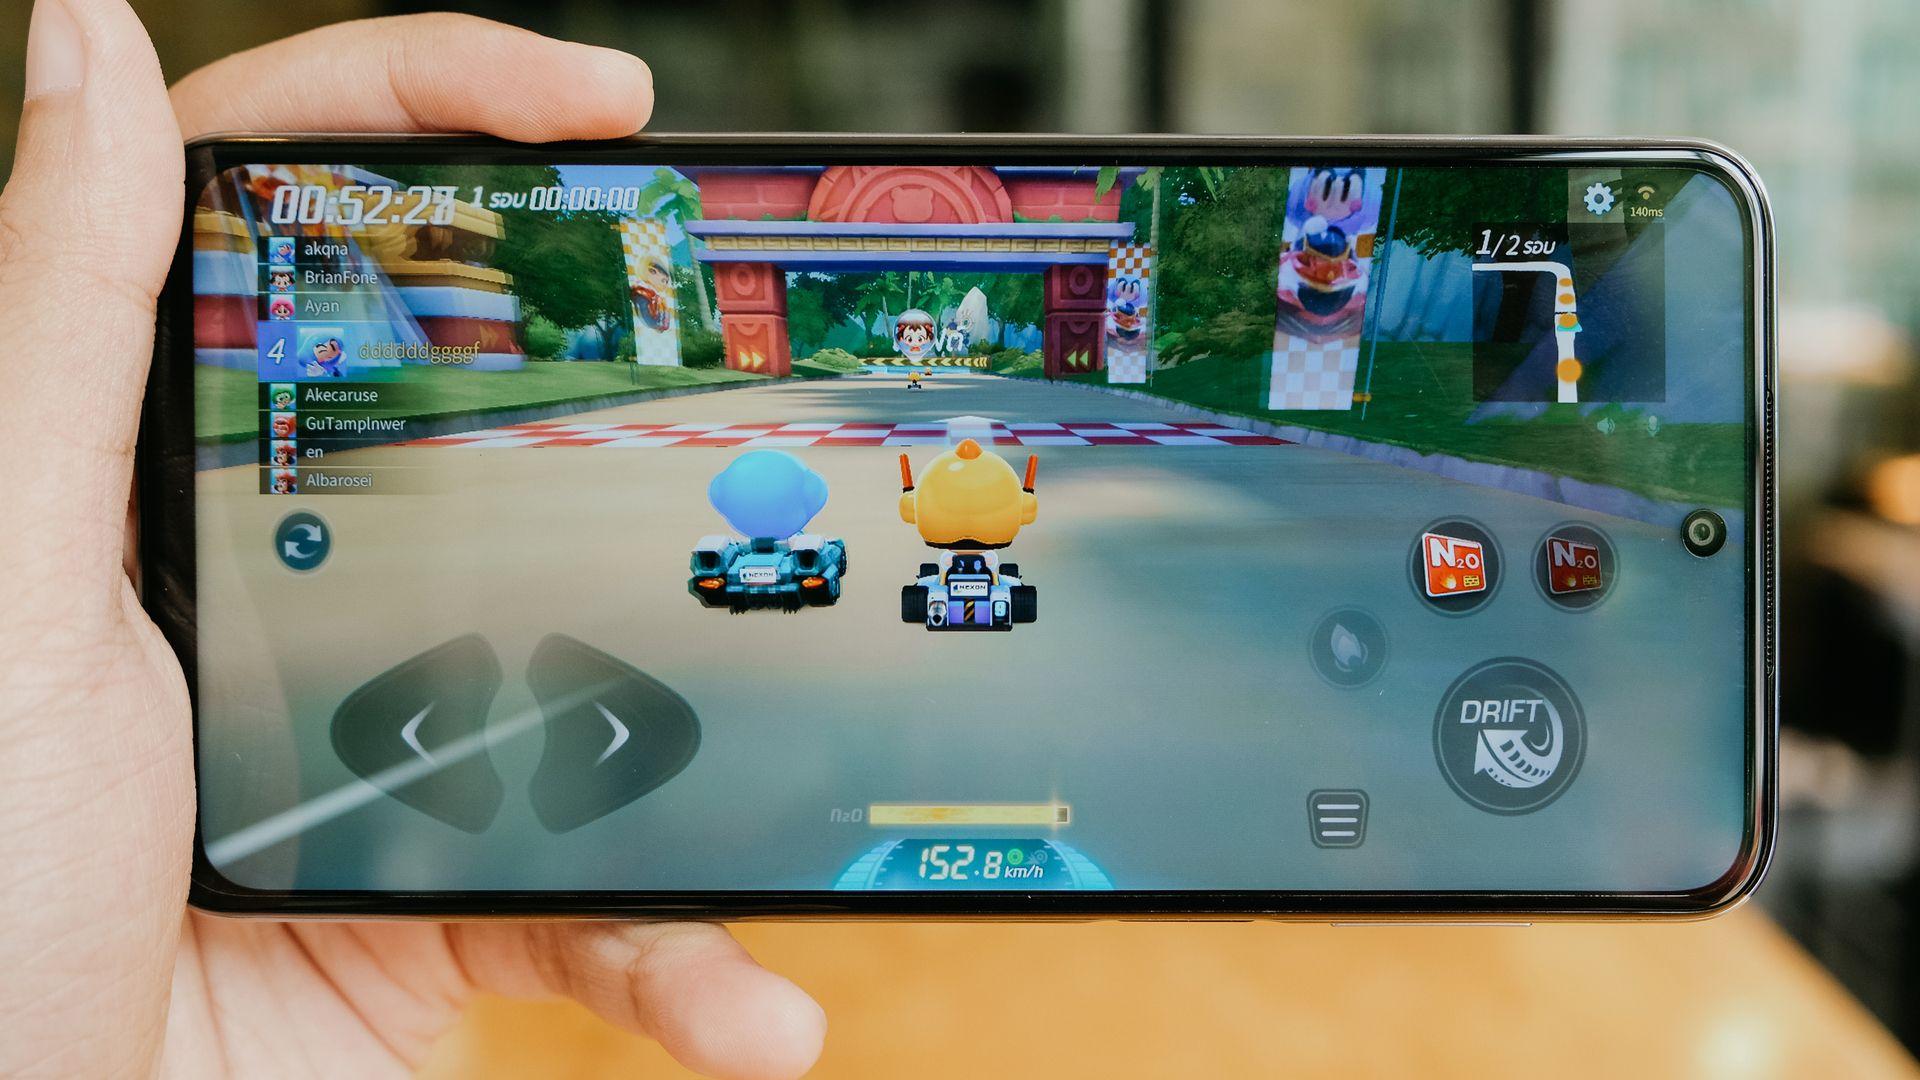 Redmi Note 9 Pro promete bom desempenho para games. (Imagem: Framesira/Shutterstock)